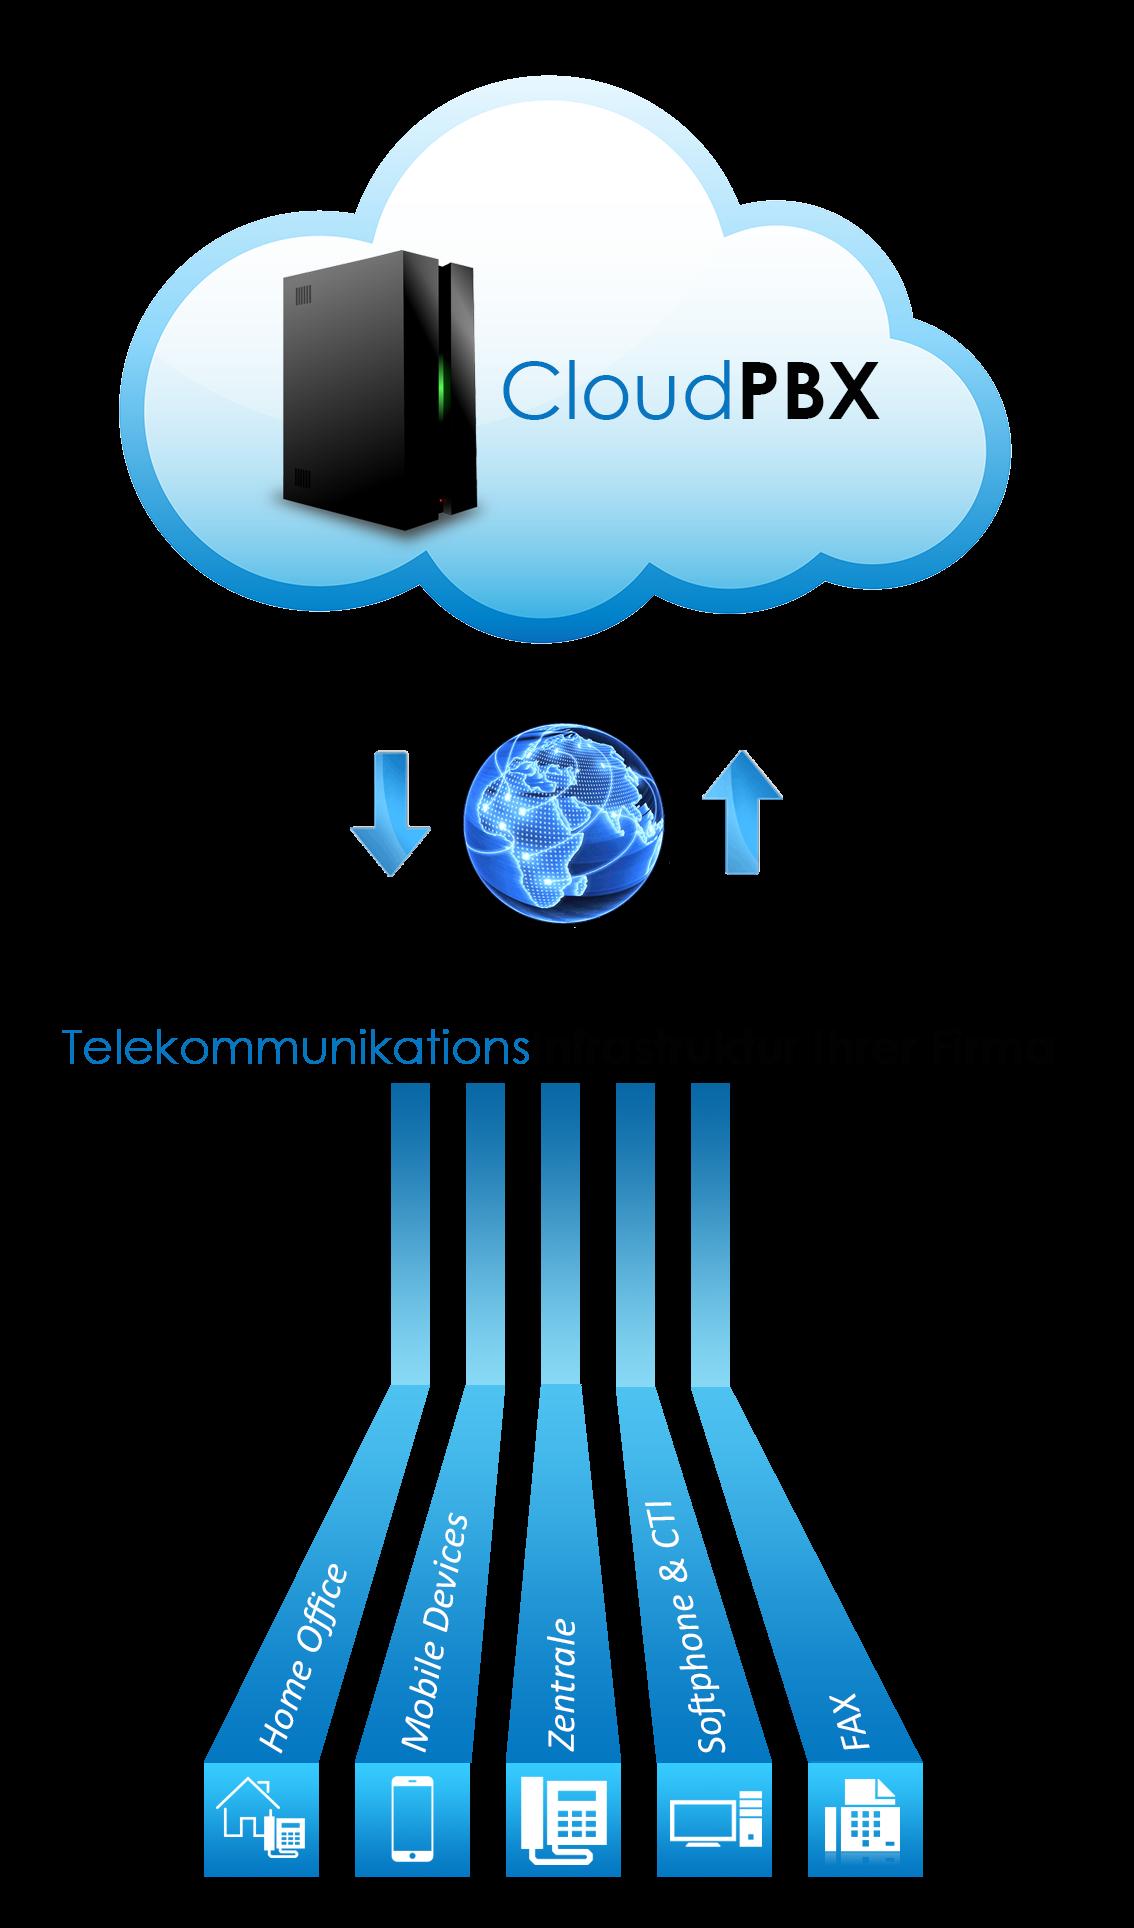 Cloudpbx digitalphone nfon 3cx voip Telefonanlage | Kommunikation ...